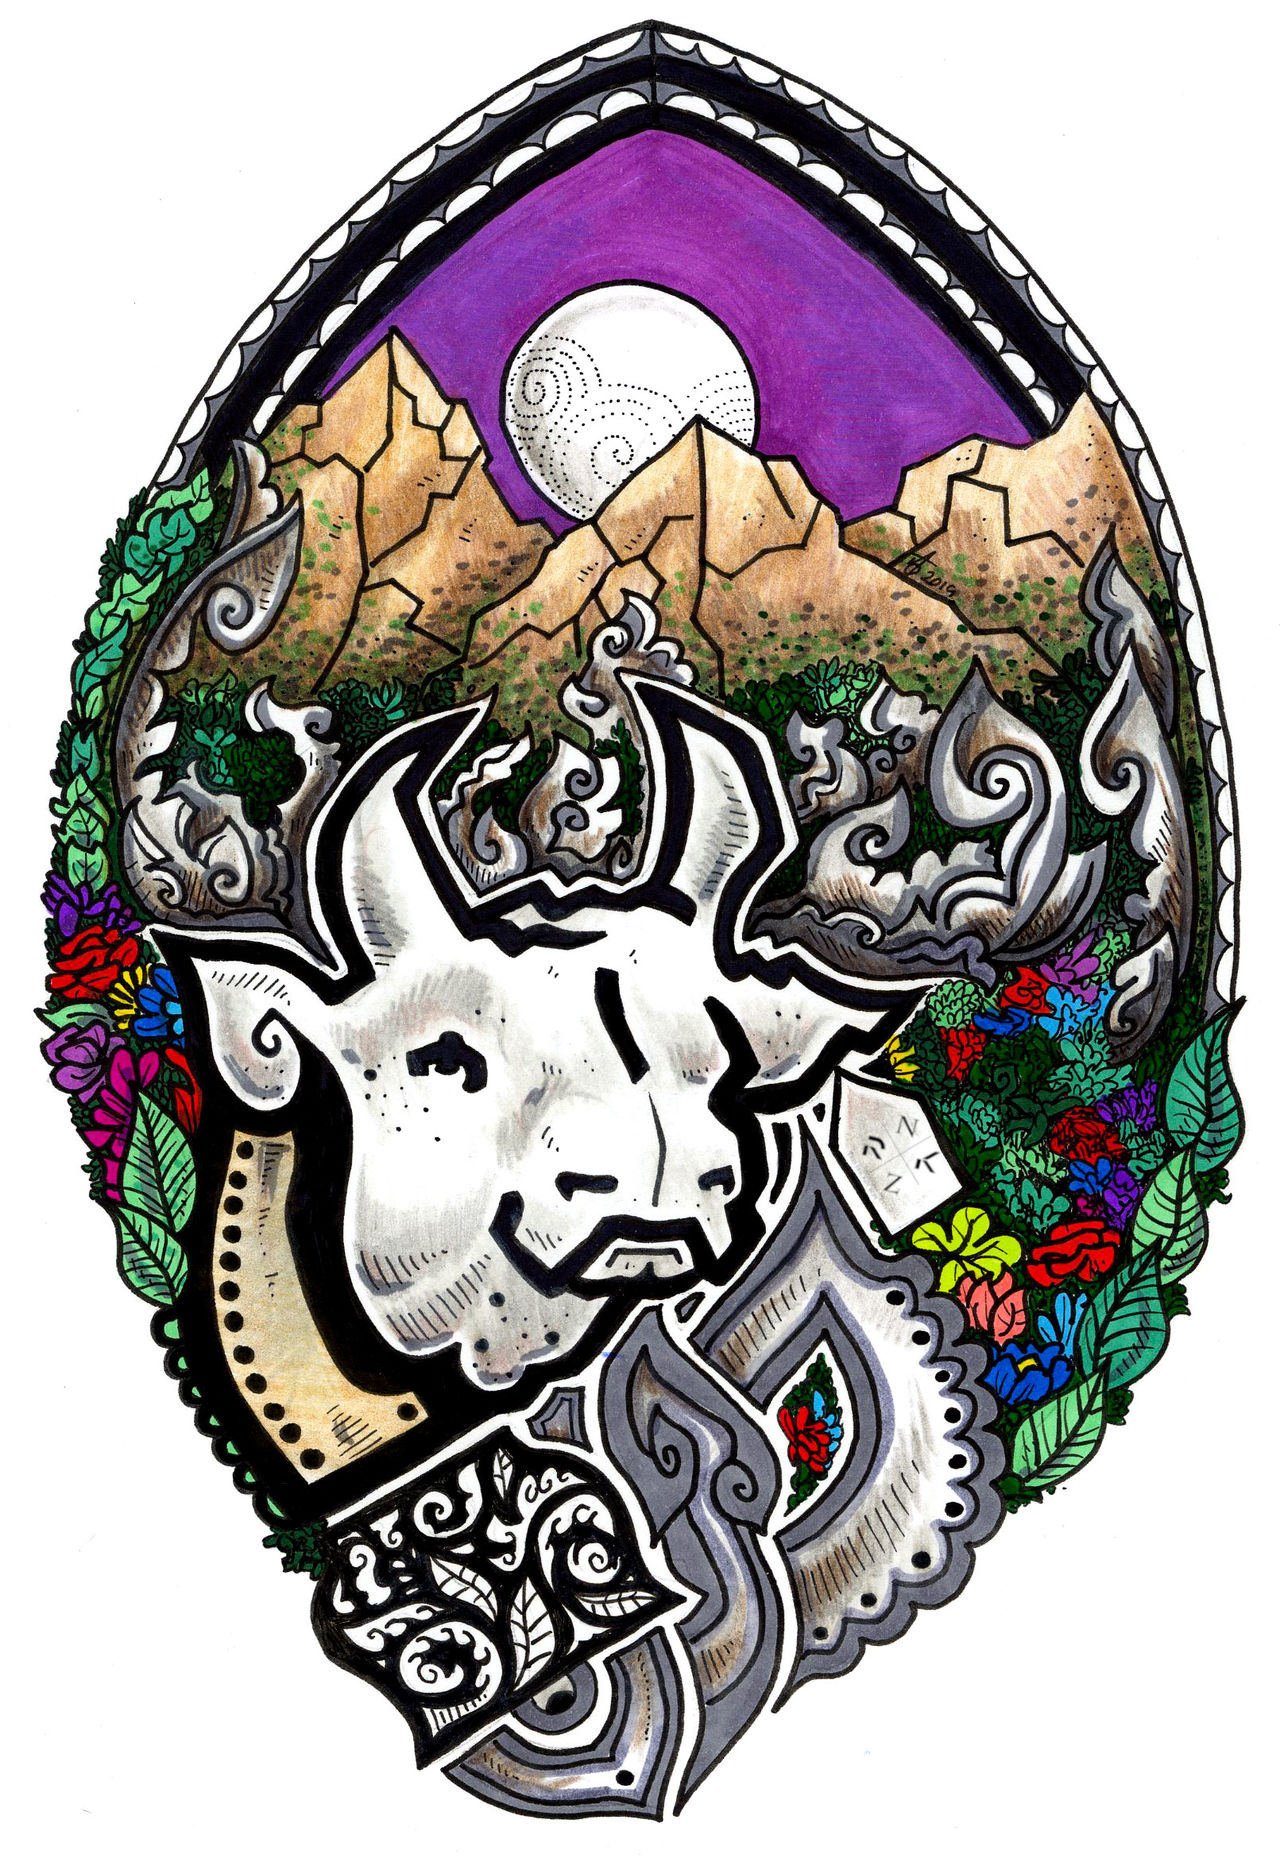 Vache de Rubix Kangaroo